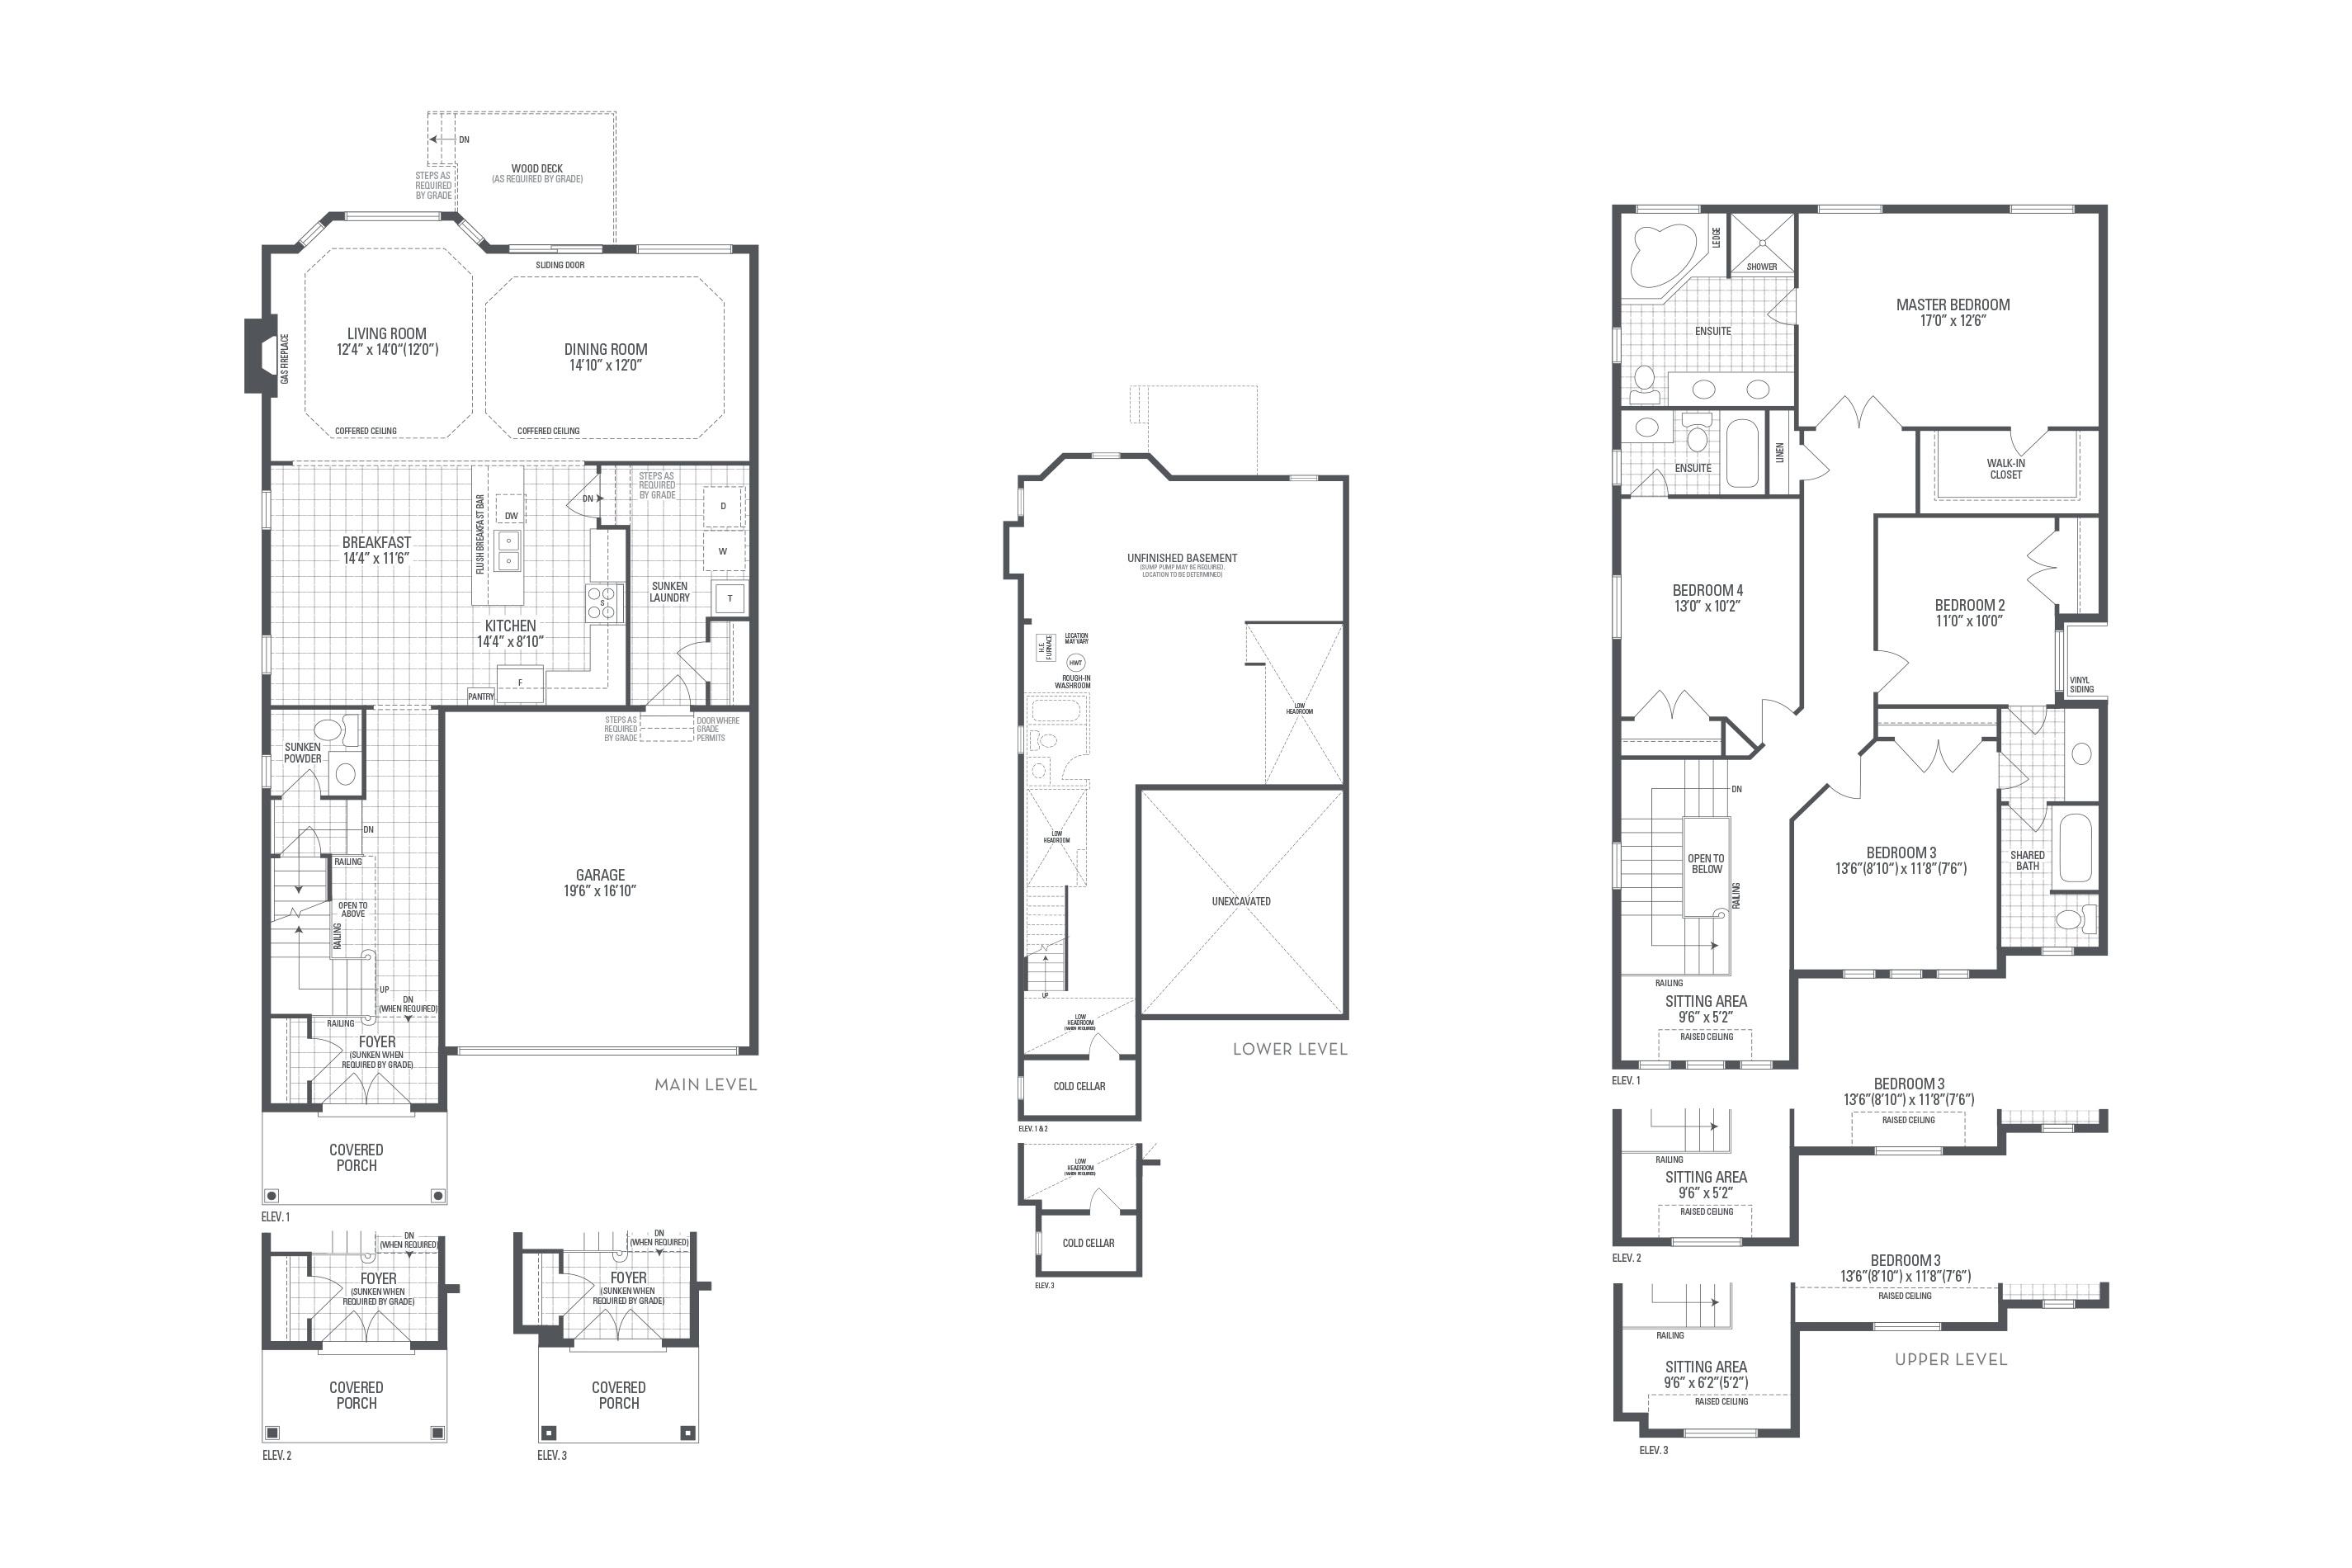 Bronte 05 Elev. 3 Floorplan